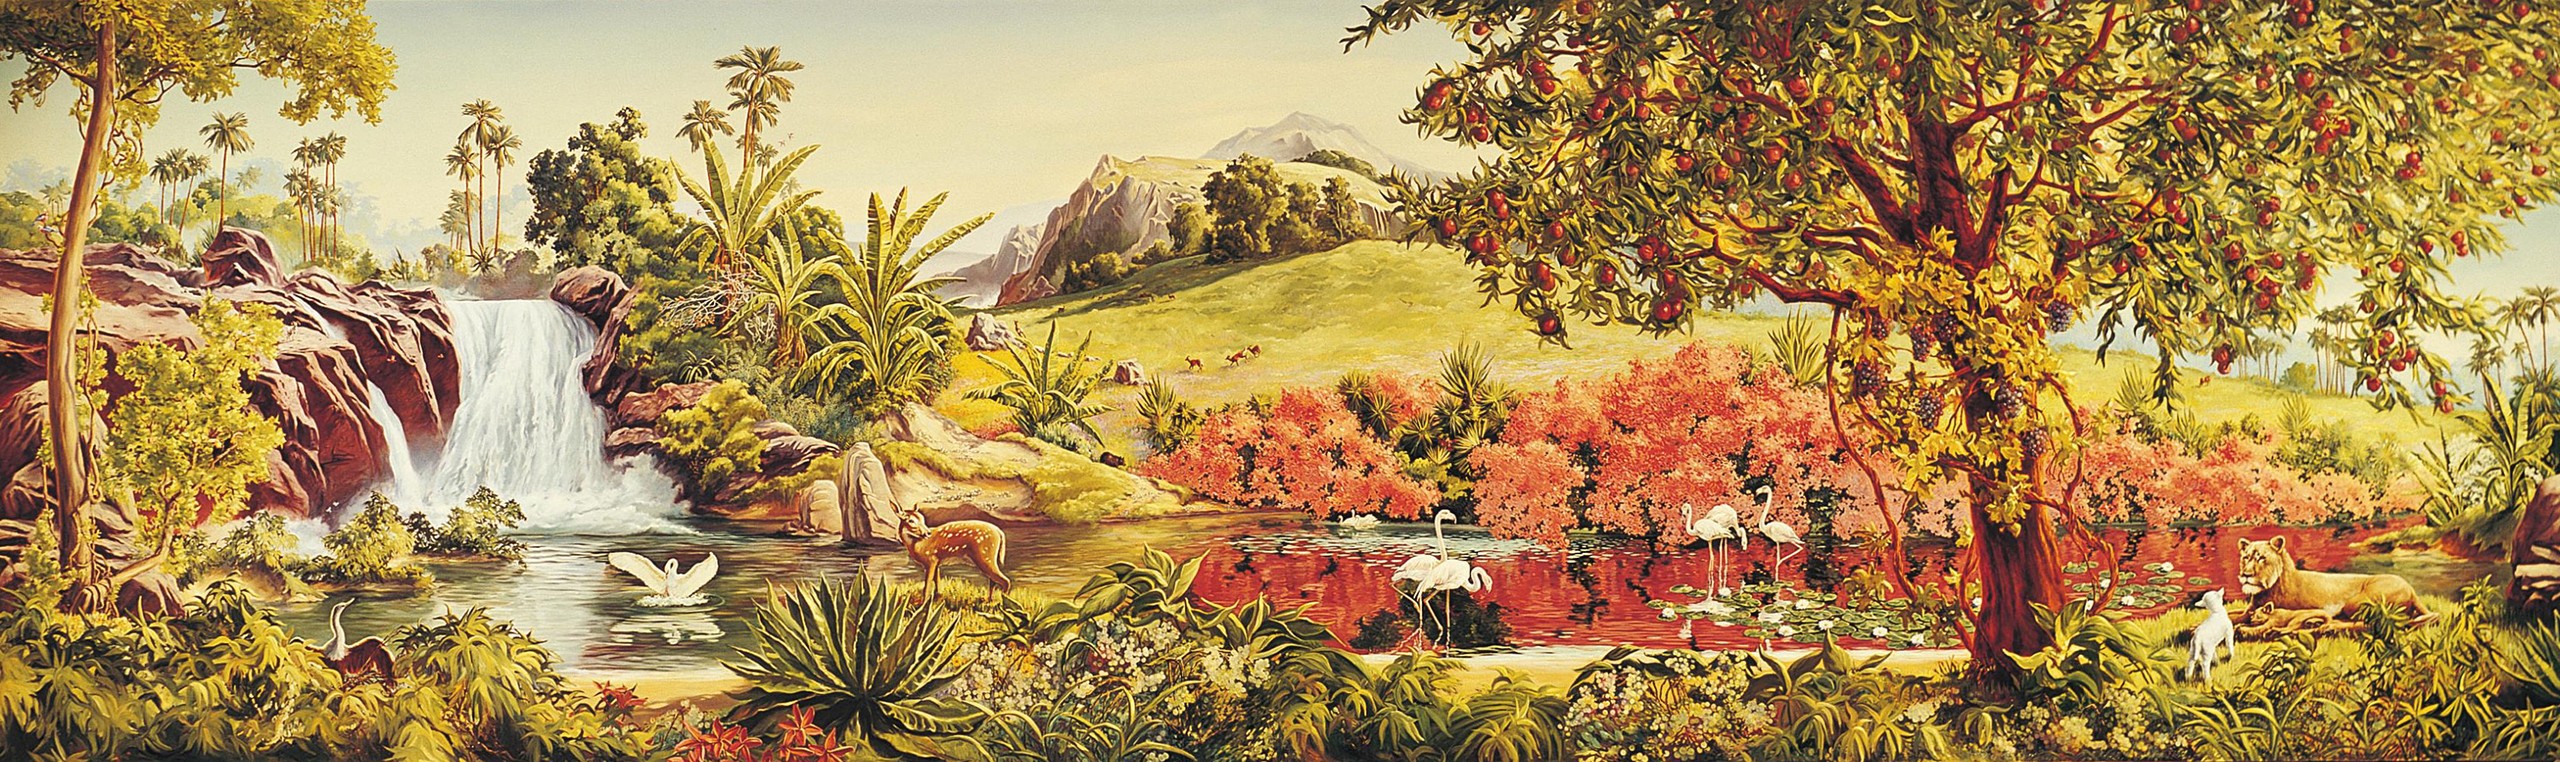 https://i2.wp.com/media.ldscdn.org/images/media-library/gospel-art/old-testament/garden-of-eden-clawson-art-37727-wallpaper.jpg